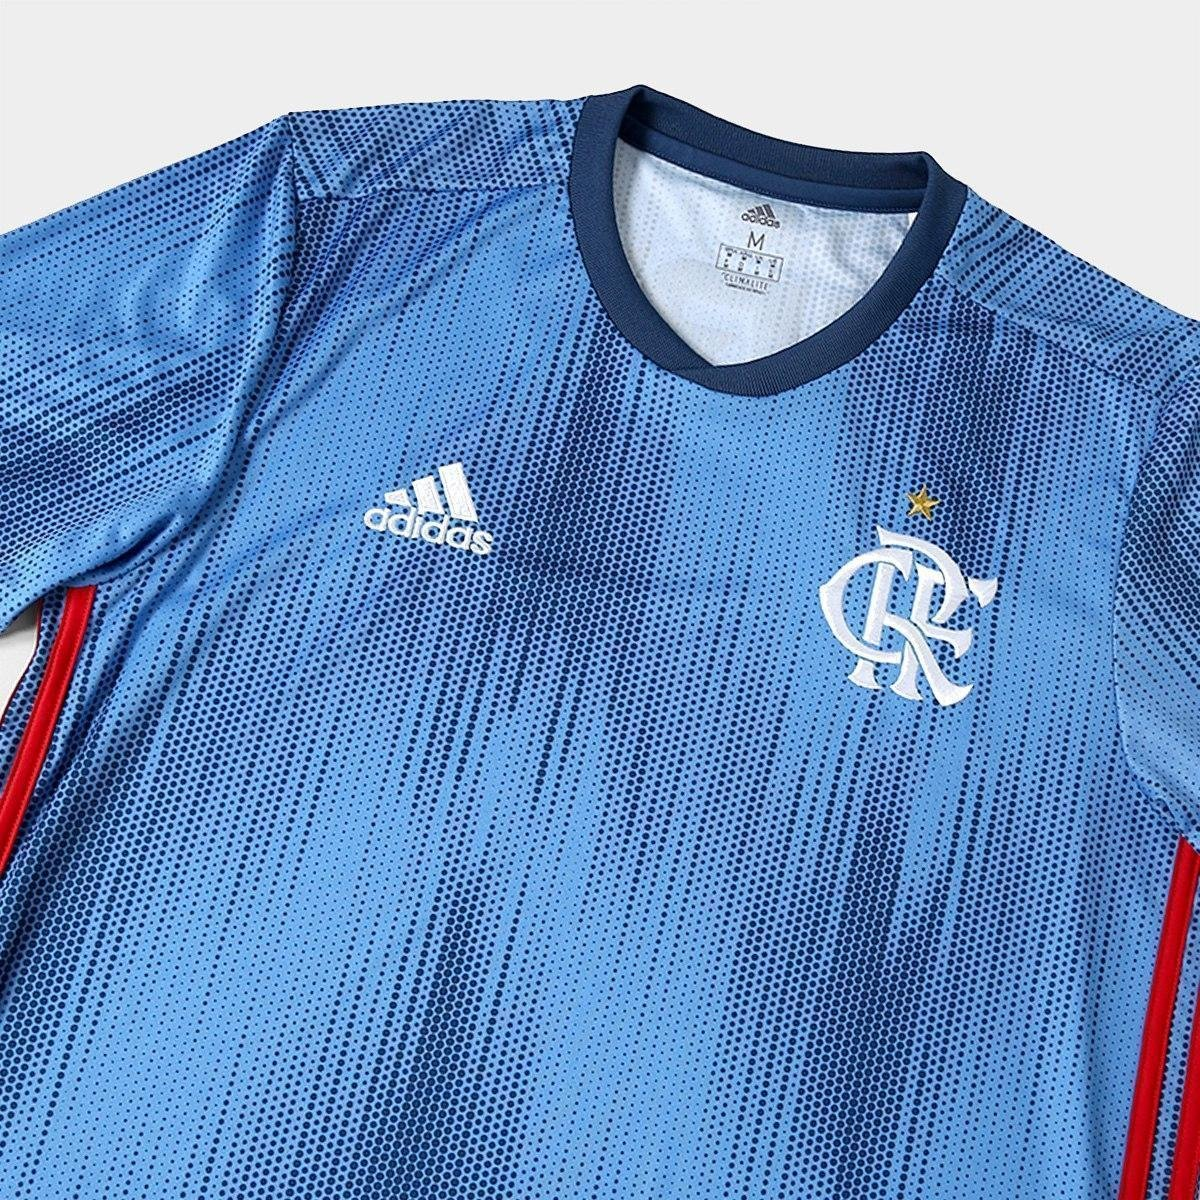 Camisa Flamengo III 2018 s n° - Torcedor Adidas Masculina - Azul ... 7217a7e0ca994